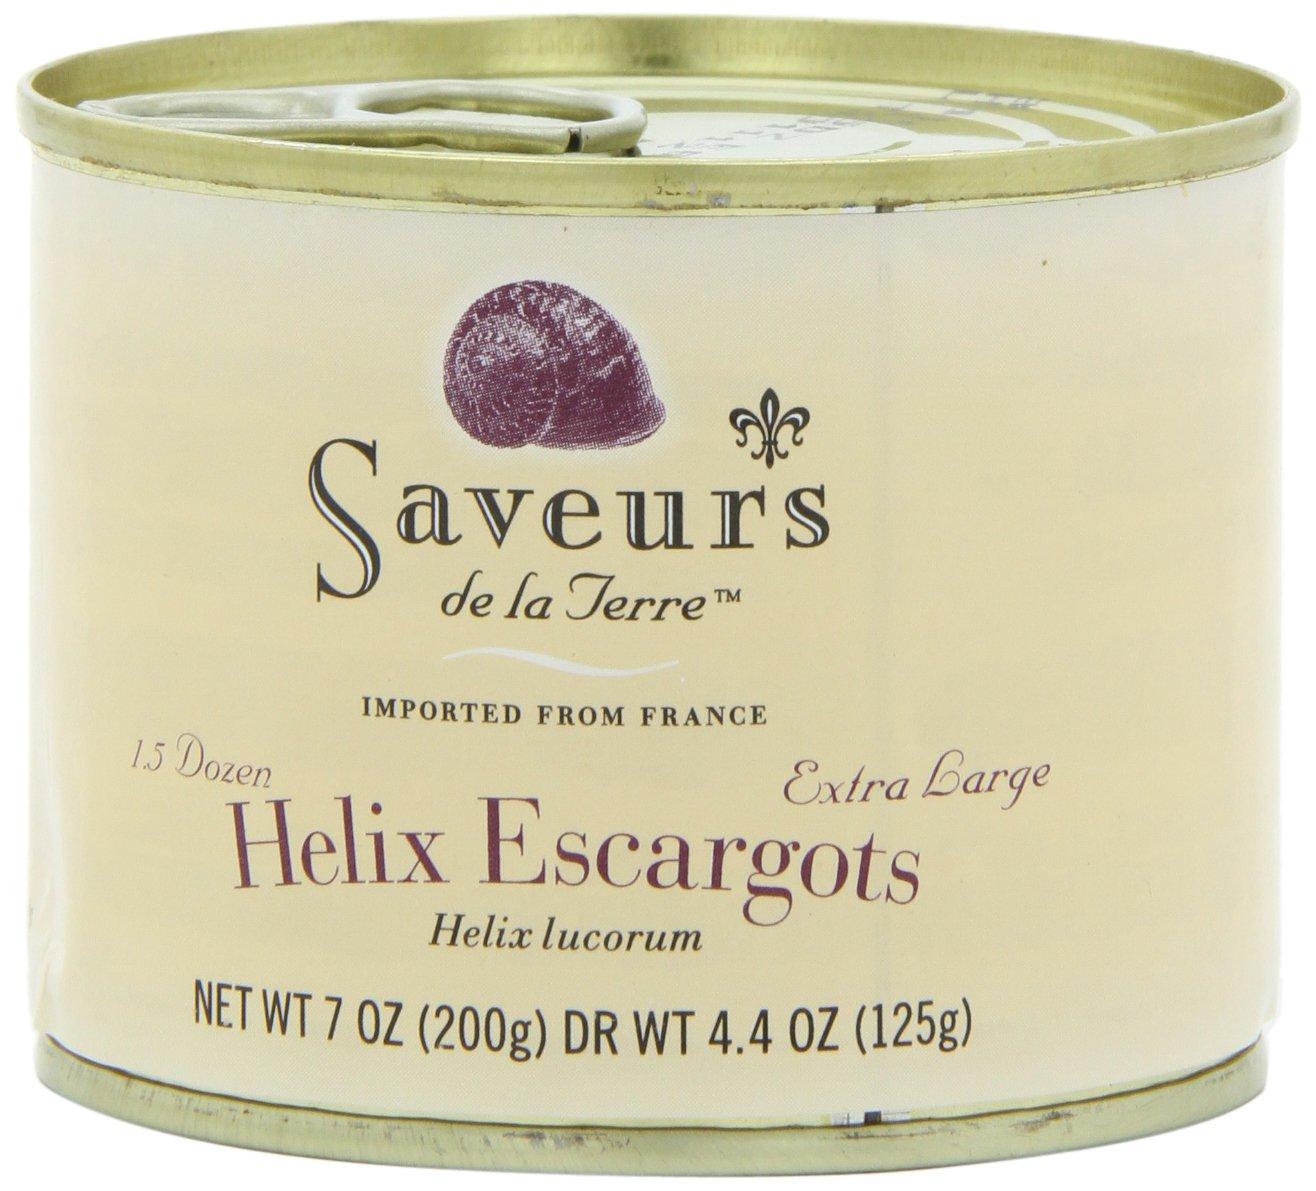 Saveurs Helix Escargot, 1.5 Dozen, Net WT 7 oz(Pack of 3) by Saveurs